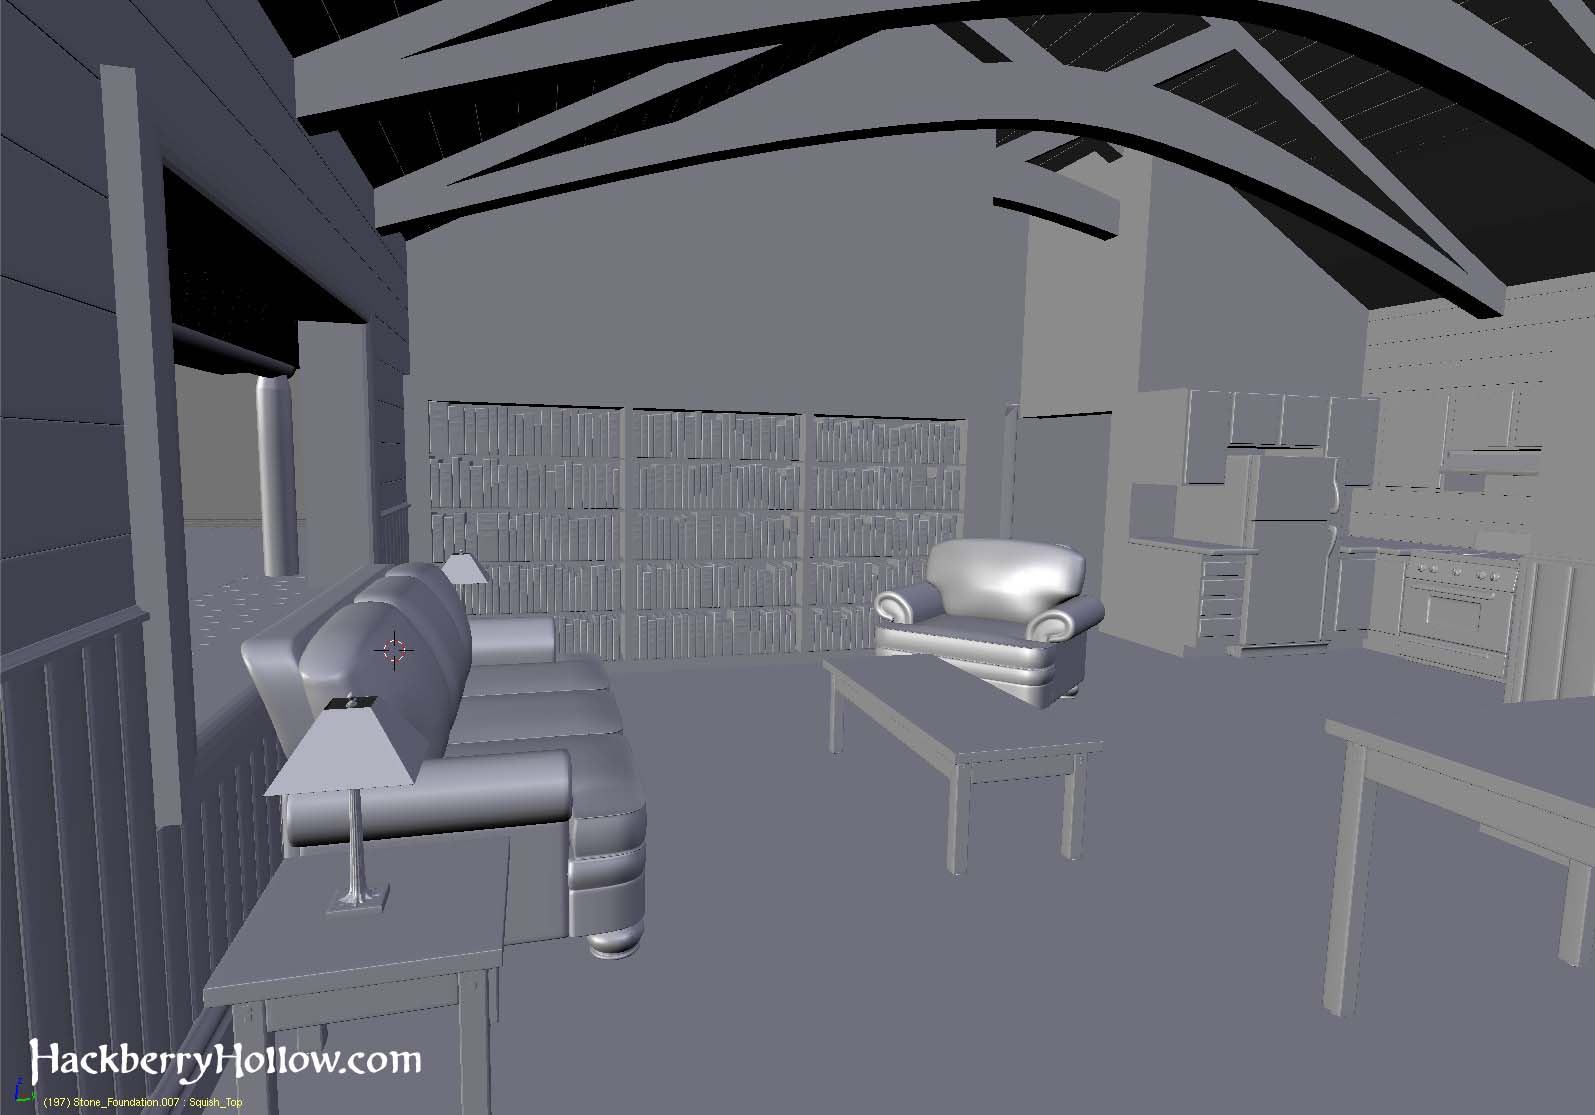 Interior concept art 3 hackberry hollow for Interieur concepts